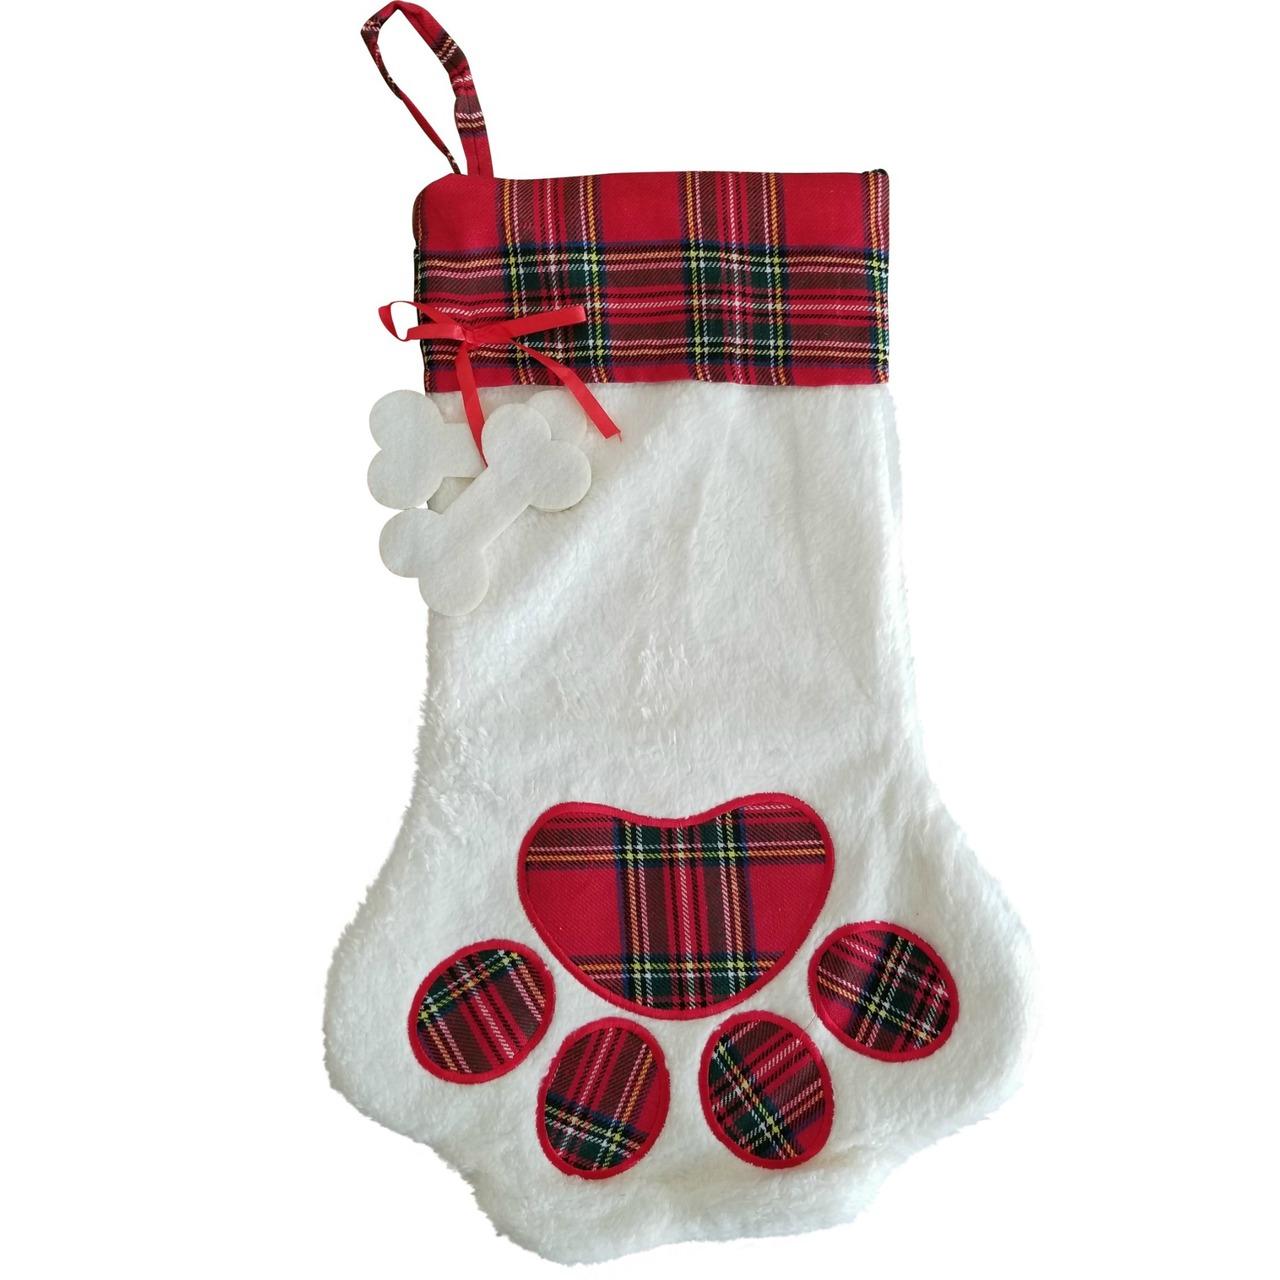 Dog Christmas Stocking.Dog Paw Plaid Christmas Stocking